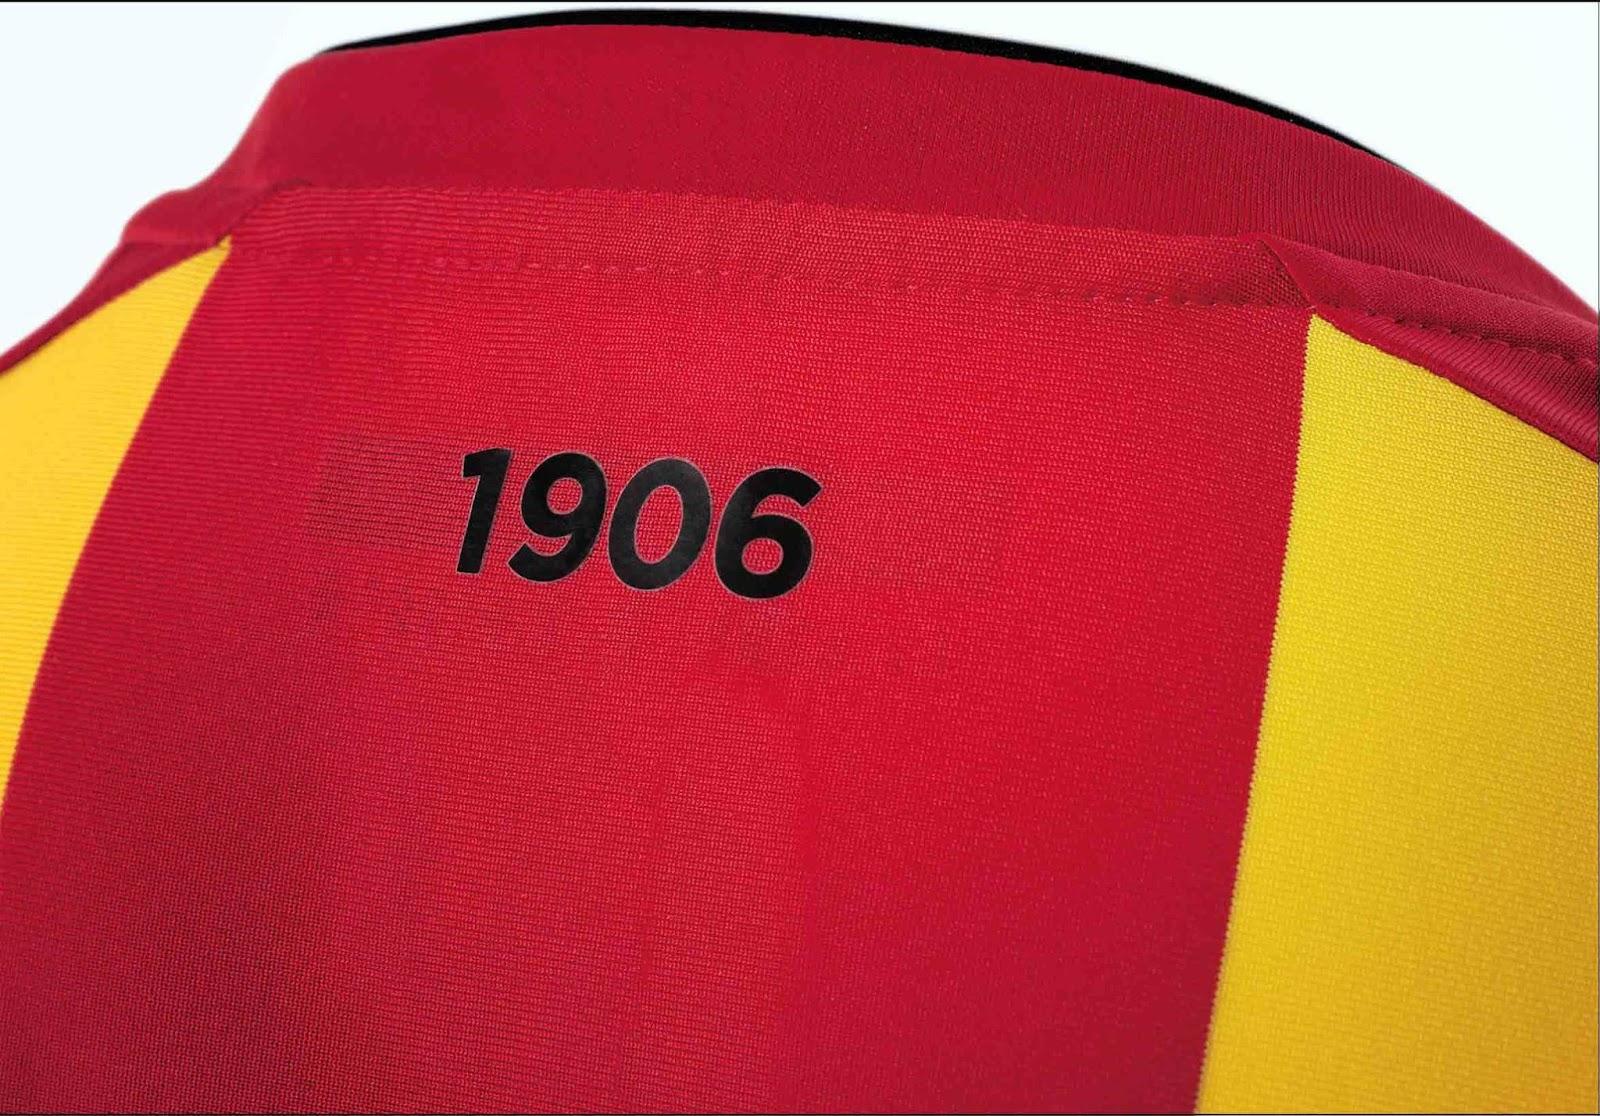 rc-lens-16-17-kit-home-collar-back